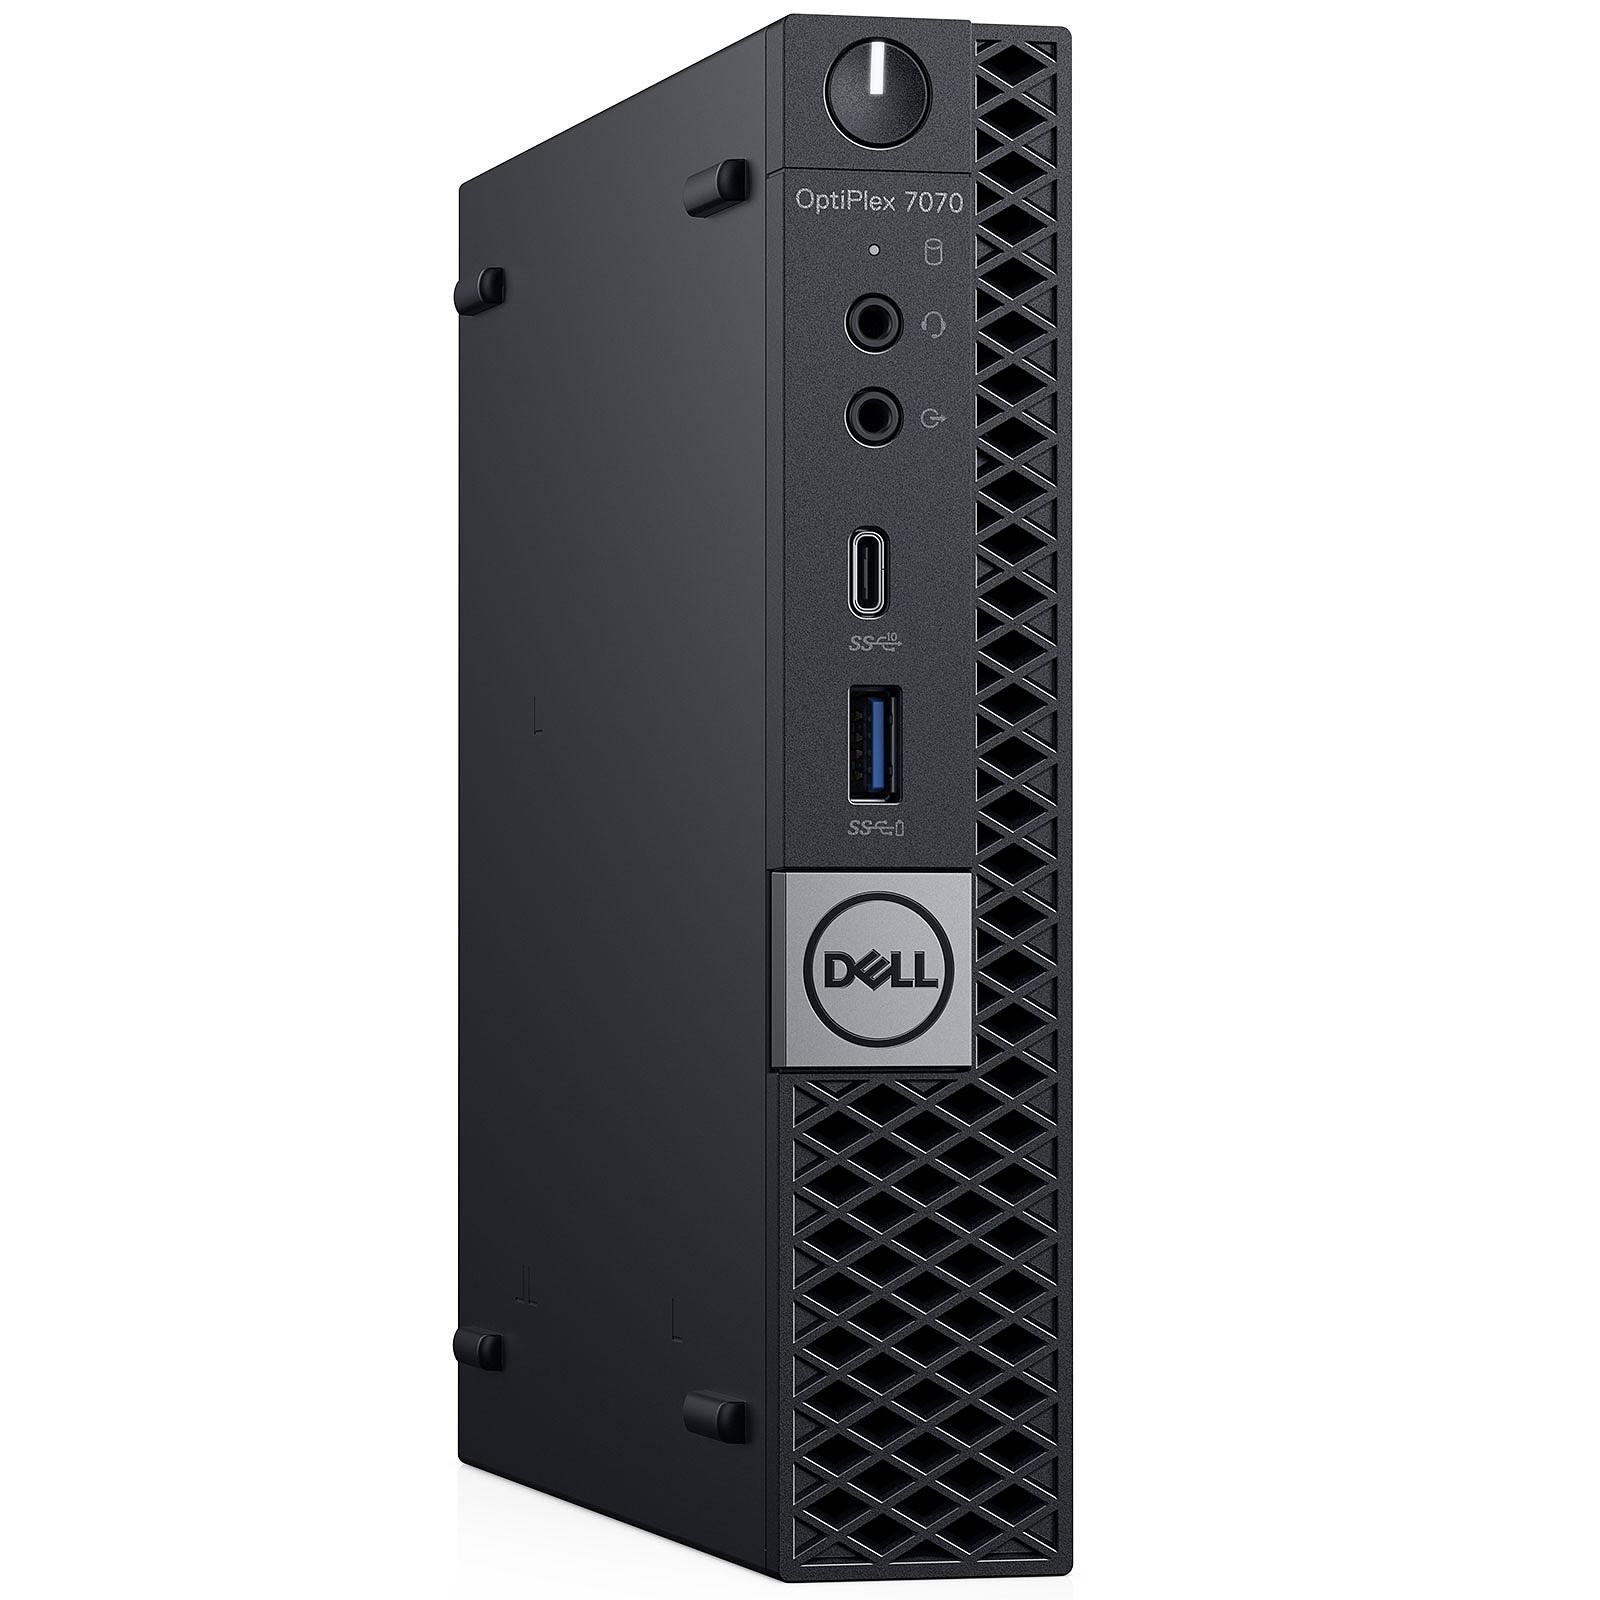 Dell OptiPlex 7070 MFF (F0JH7)